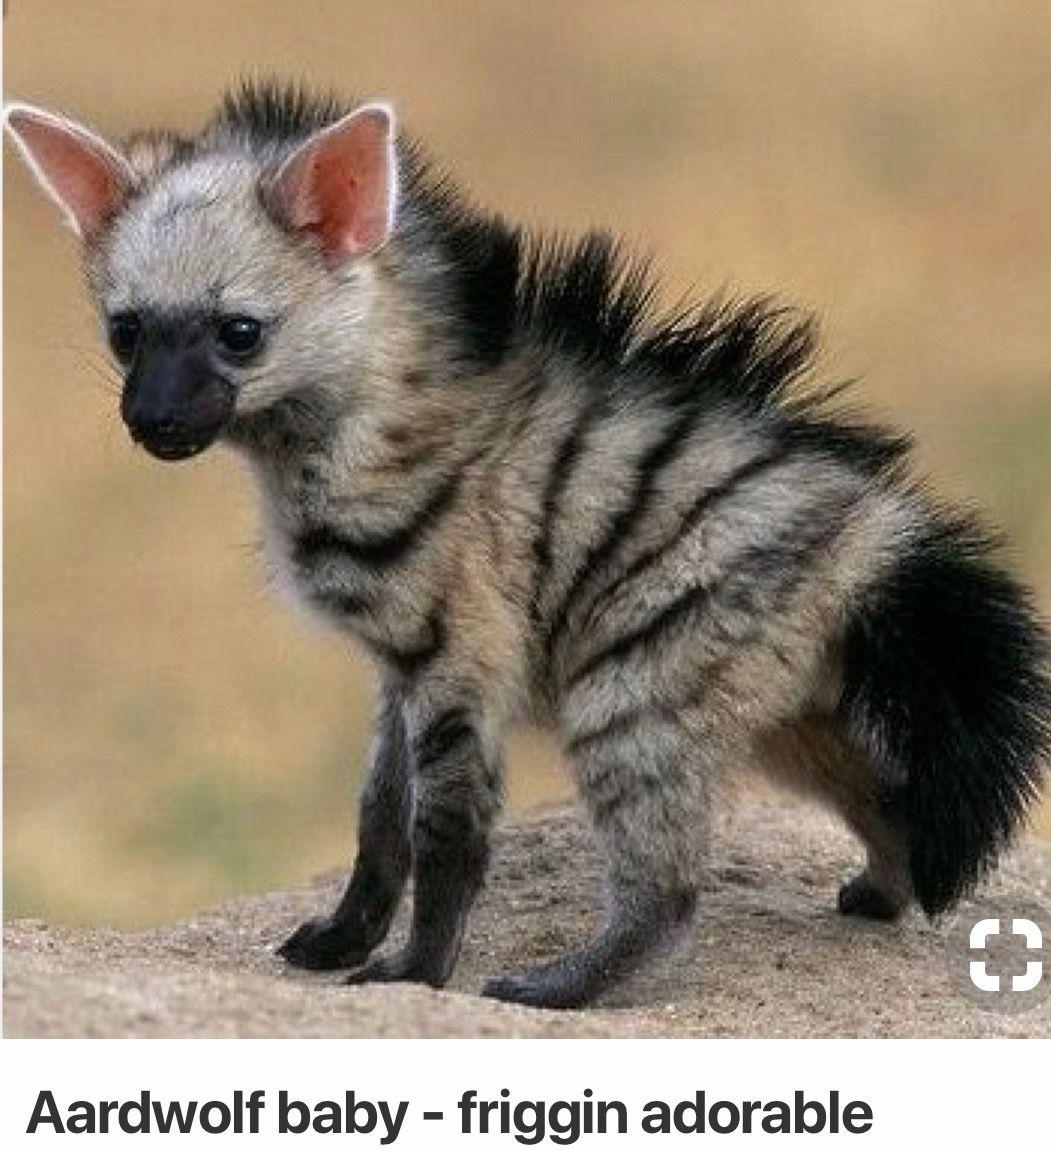 Pin By Becky Myrick On Wild In 2020 Cute Animals Unusual Animals Cute Baby Animals